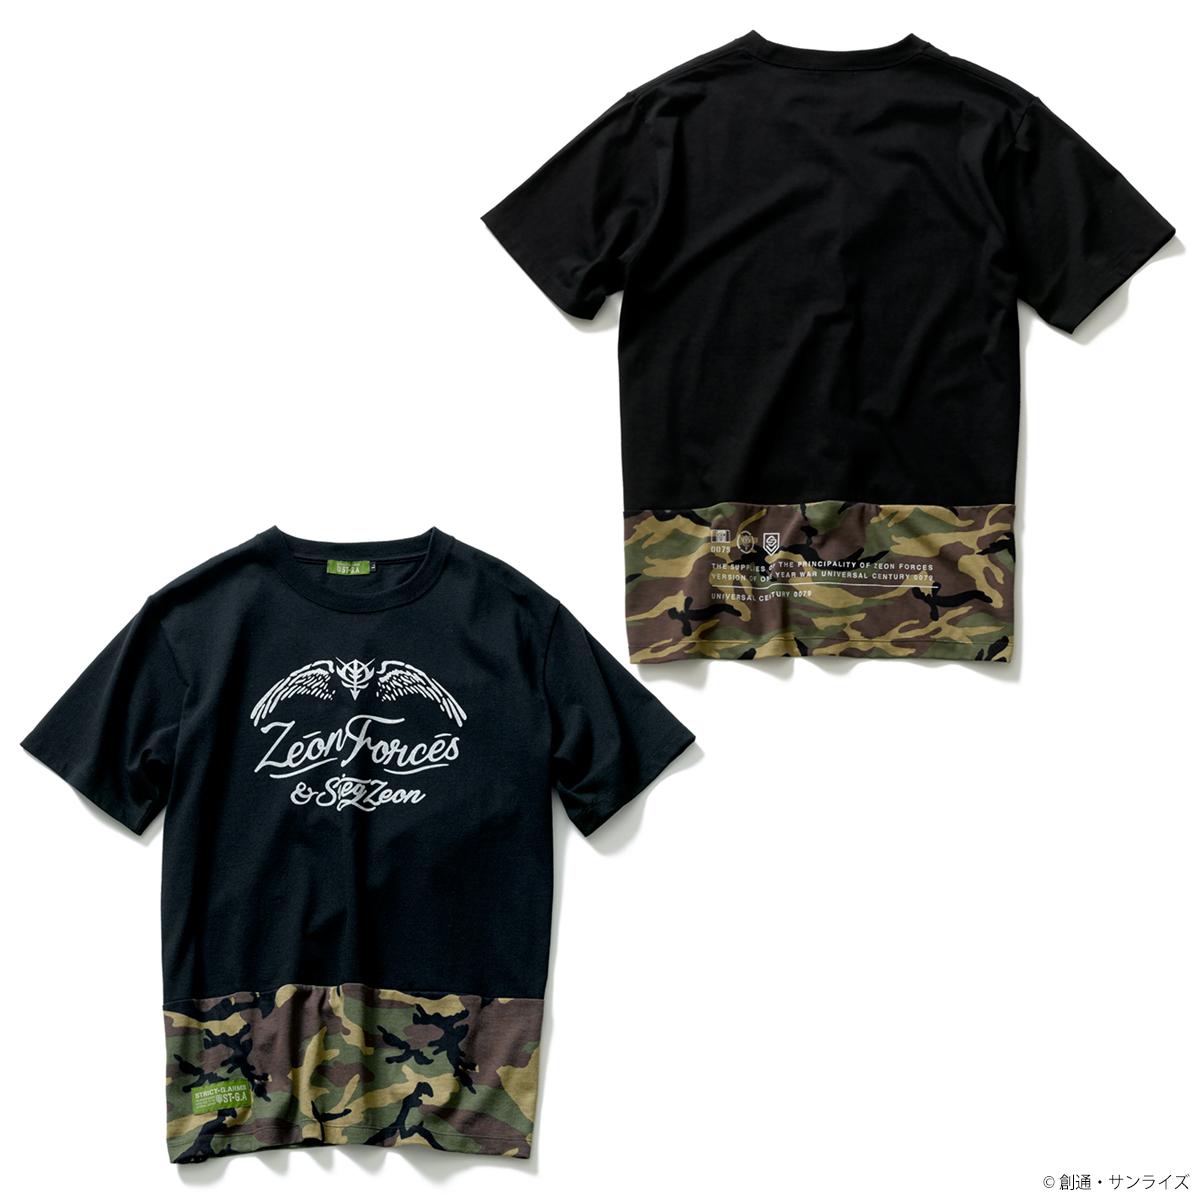 STRICT-G.ARMS『機動戦士ガンダム』 カモフラージュ裾切替Tシャツ ZEON FORCES